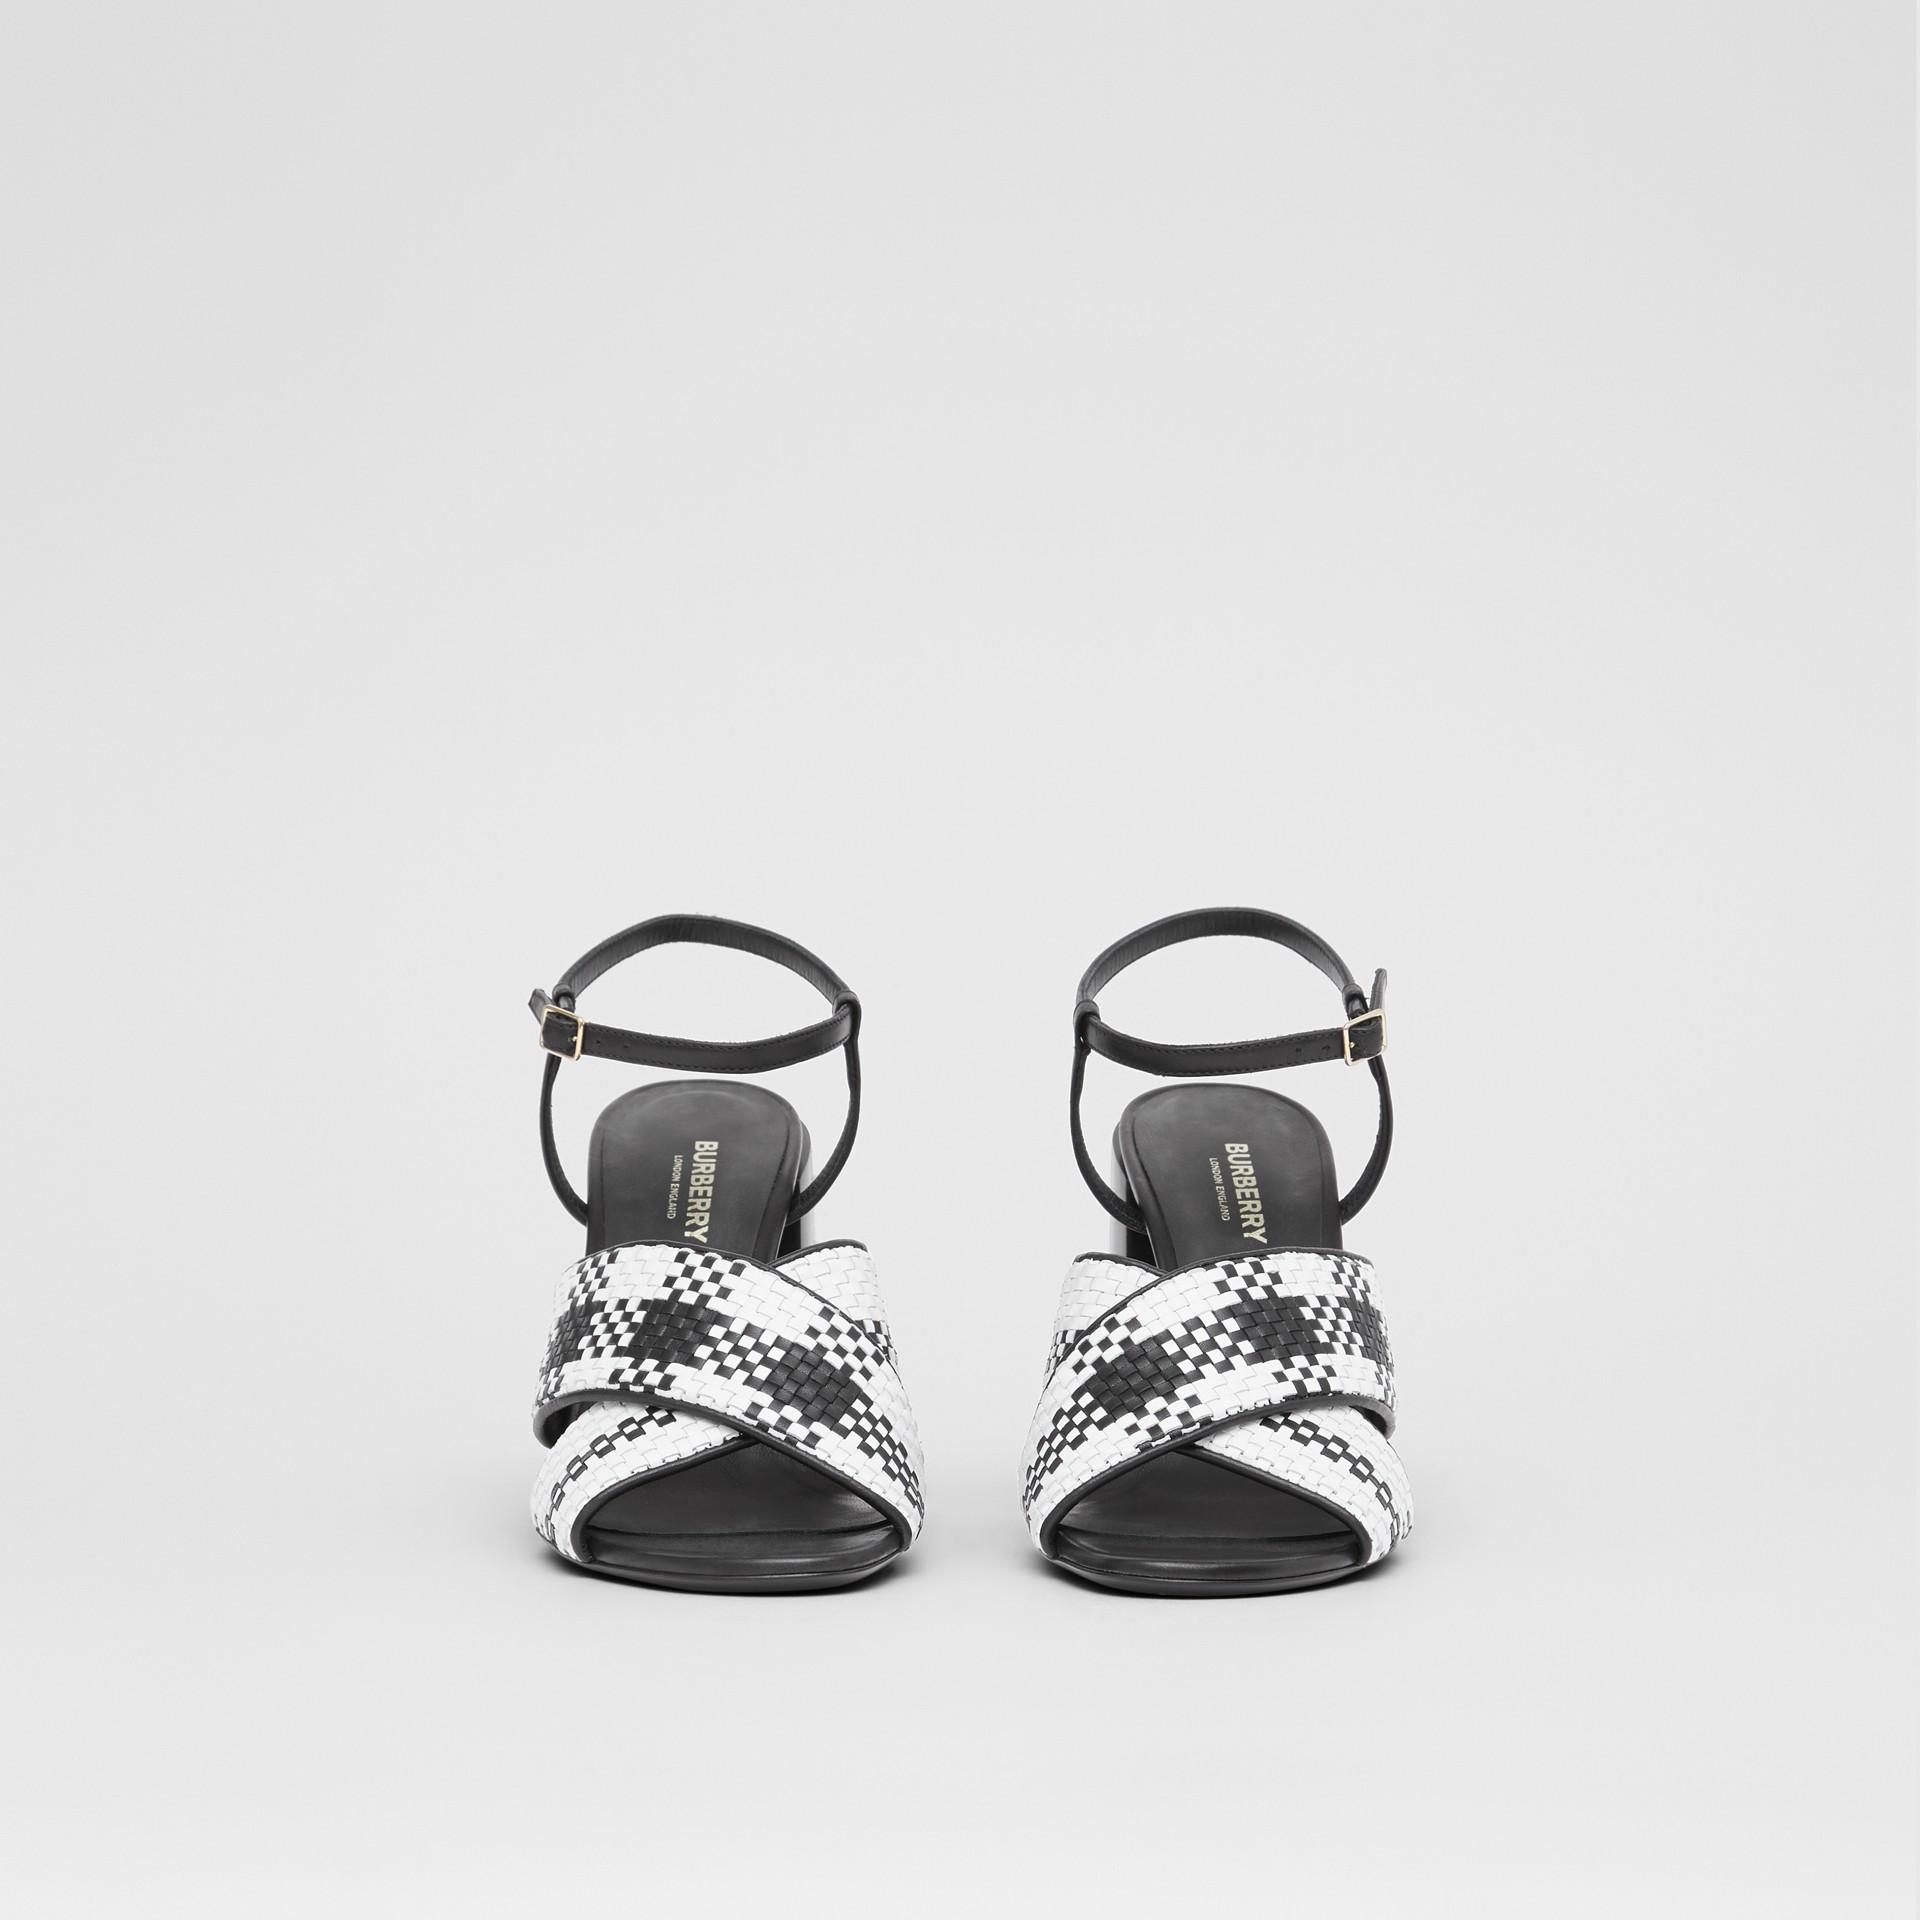 Latticed Leather Block-heel Sandals in Black/white - Women | Burberry - gallery image 3